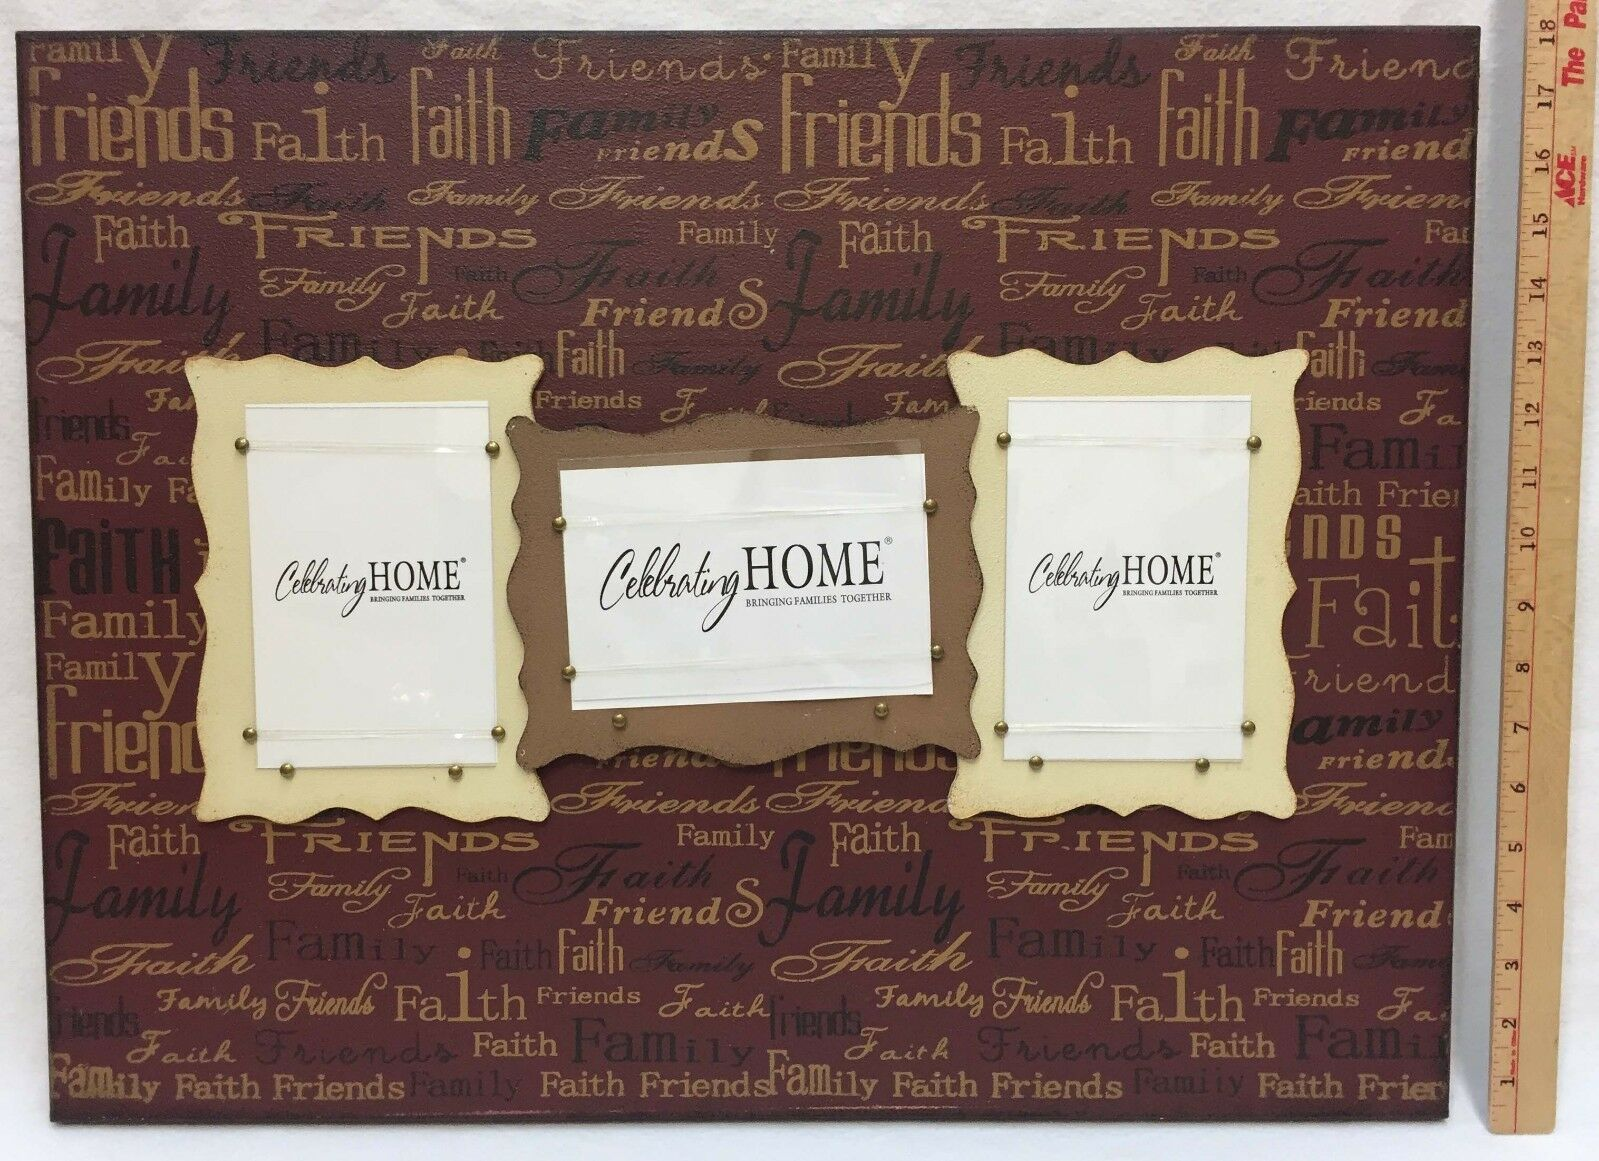 Photo Frames Wall Decor Celebrating Home Faith Family Friends 23  x 18